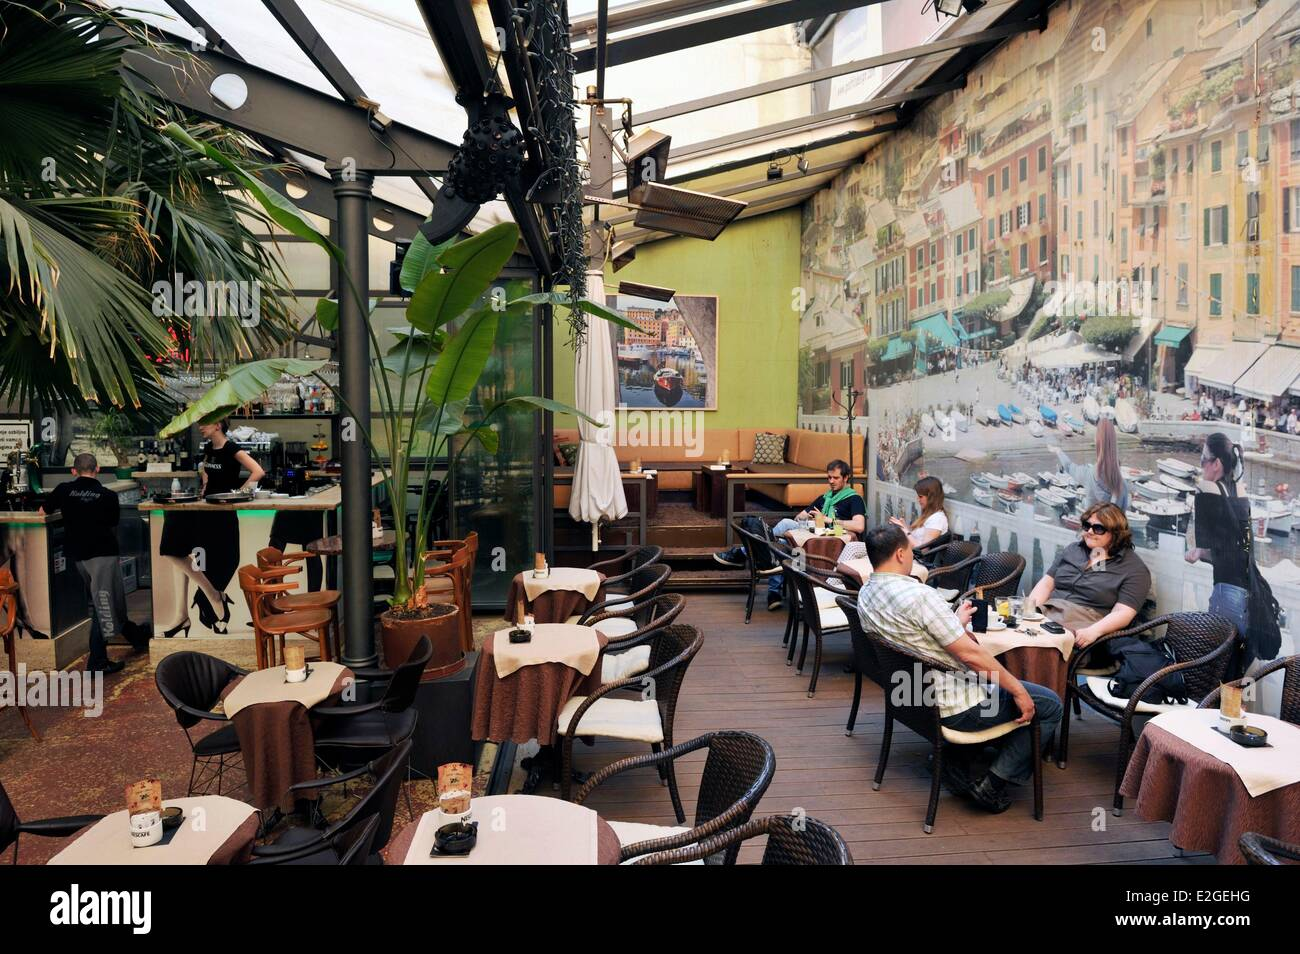 Croatia Zagreb Kolding Caffe Berislaviceva Street Stock Photo Alamy